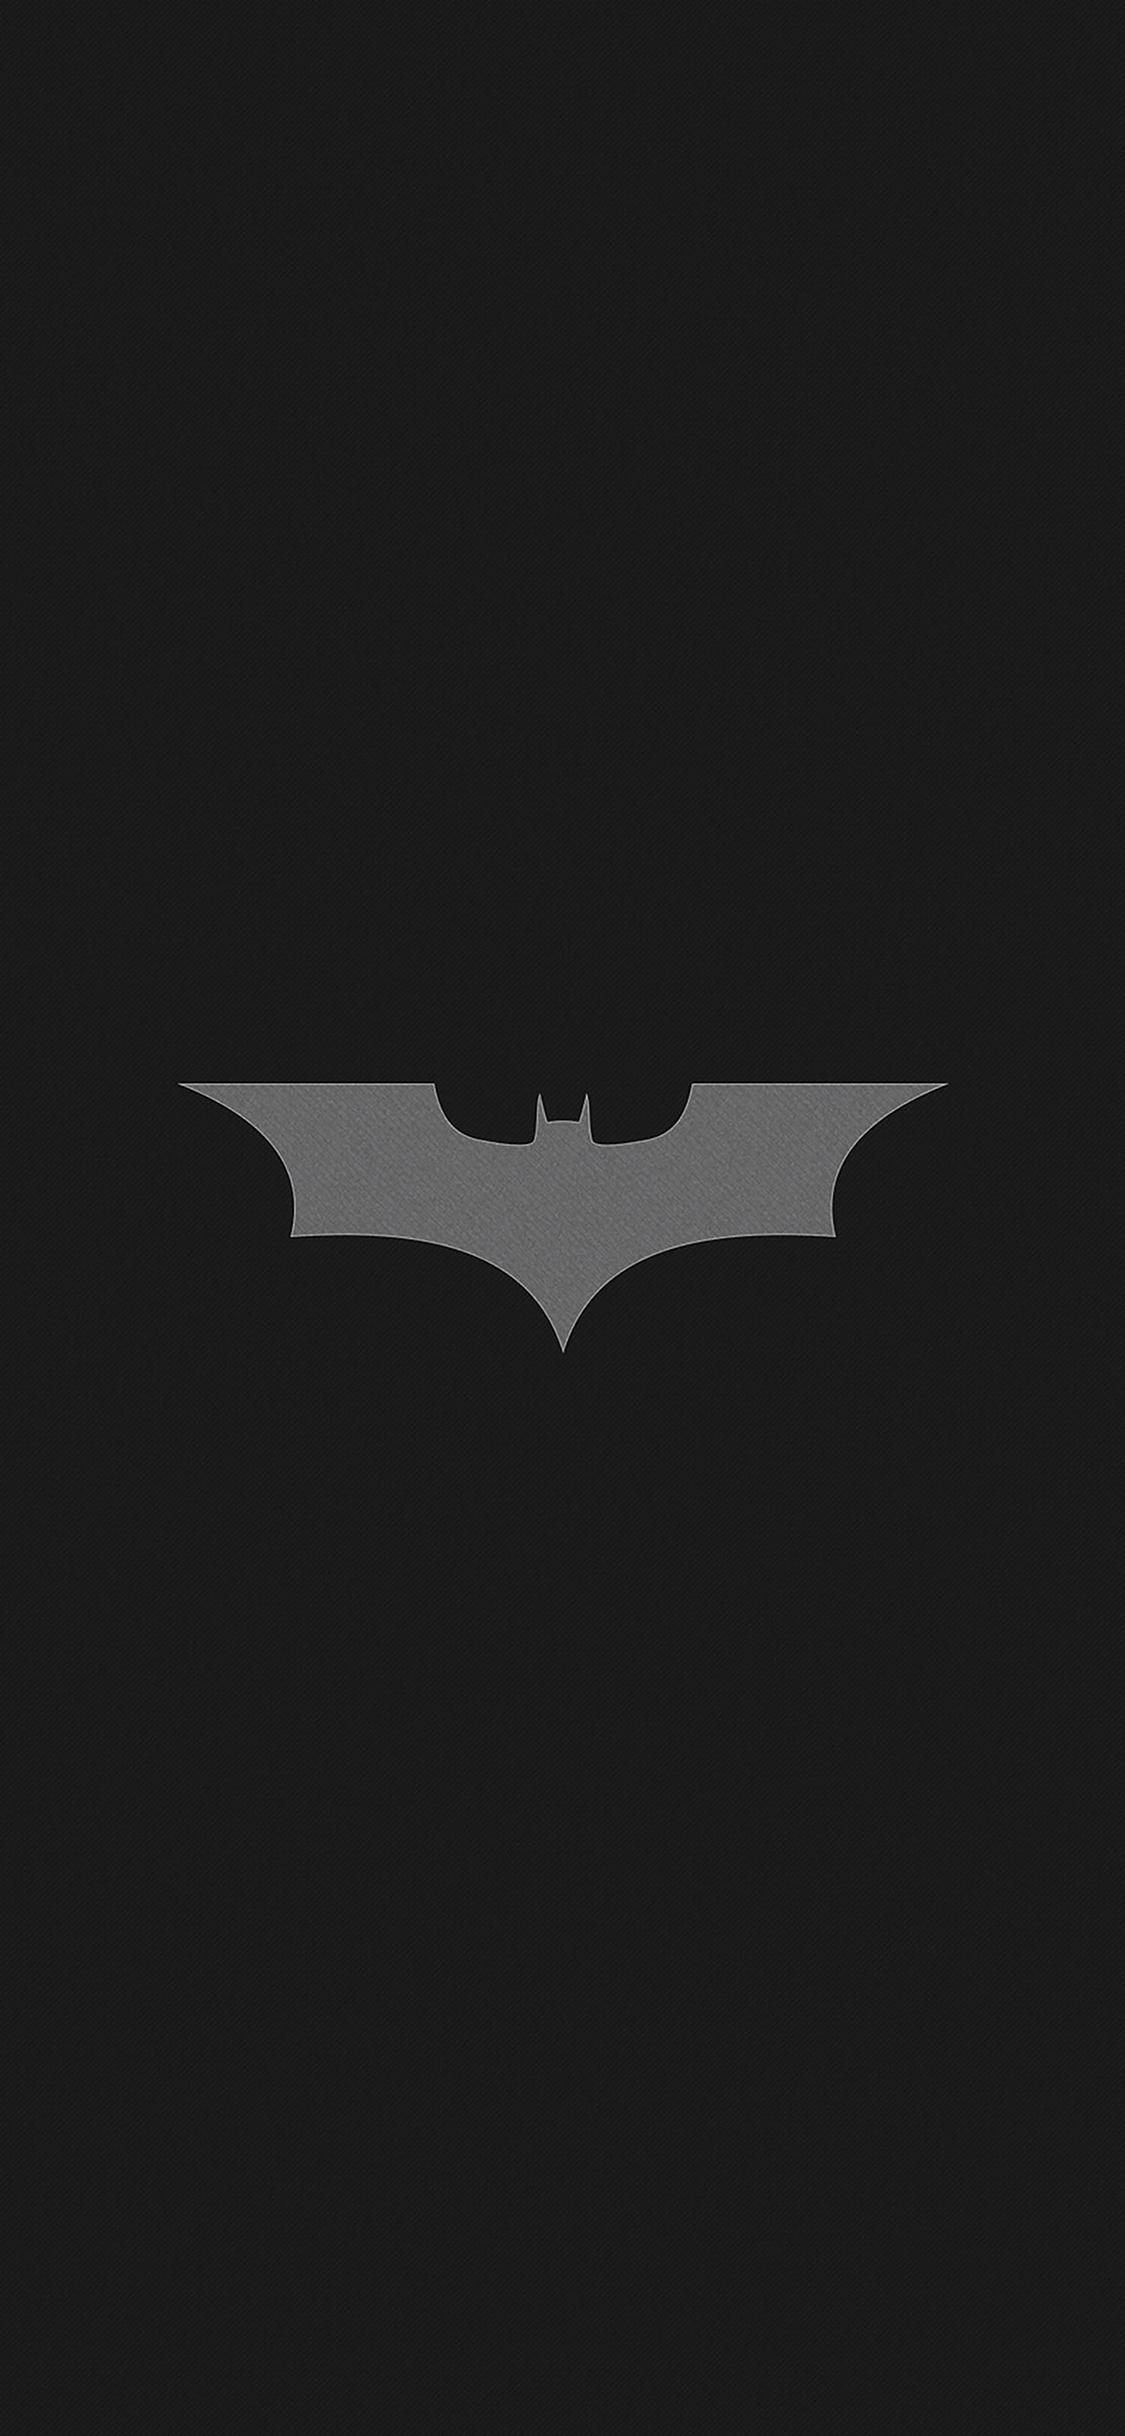 iPhoneXpapers.com-Apple-iPhone-wallpaper-ae92-batman-dark-night-logo-simple-minimal